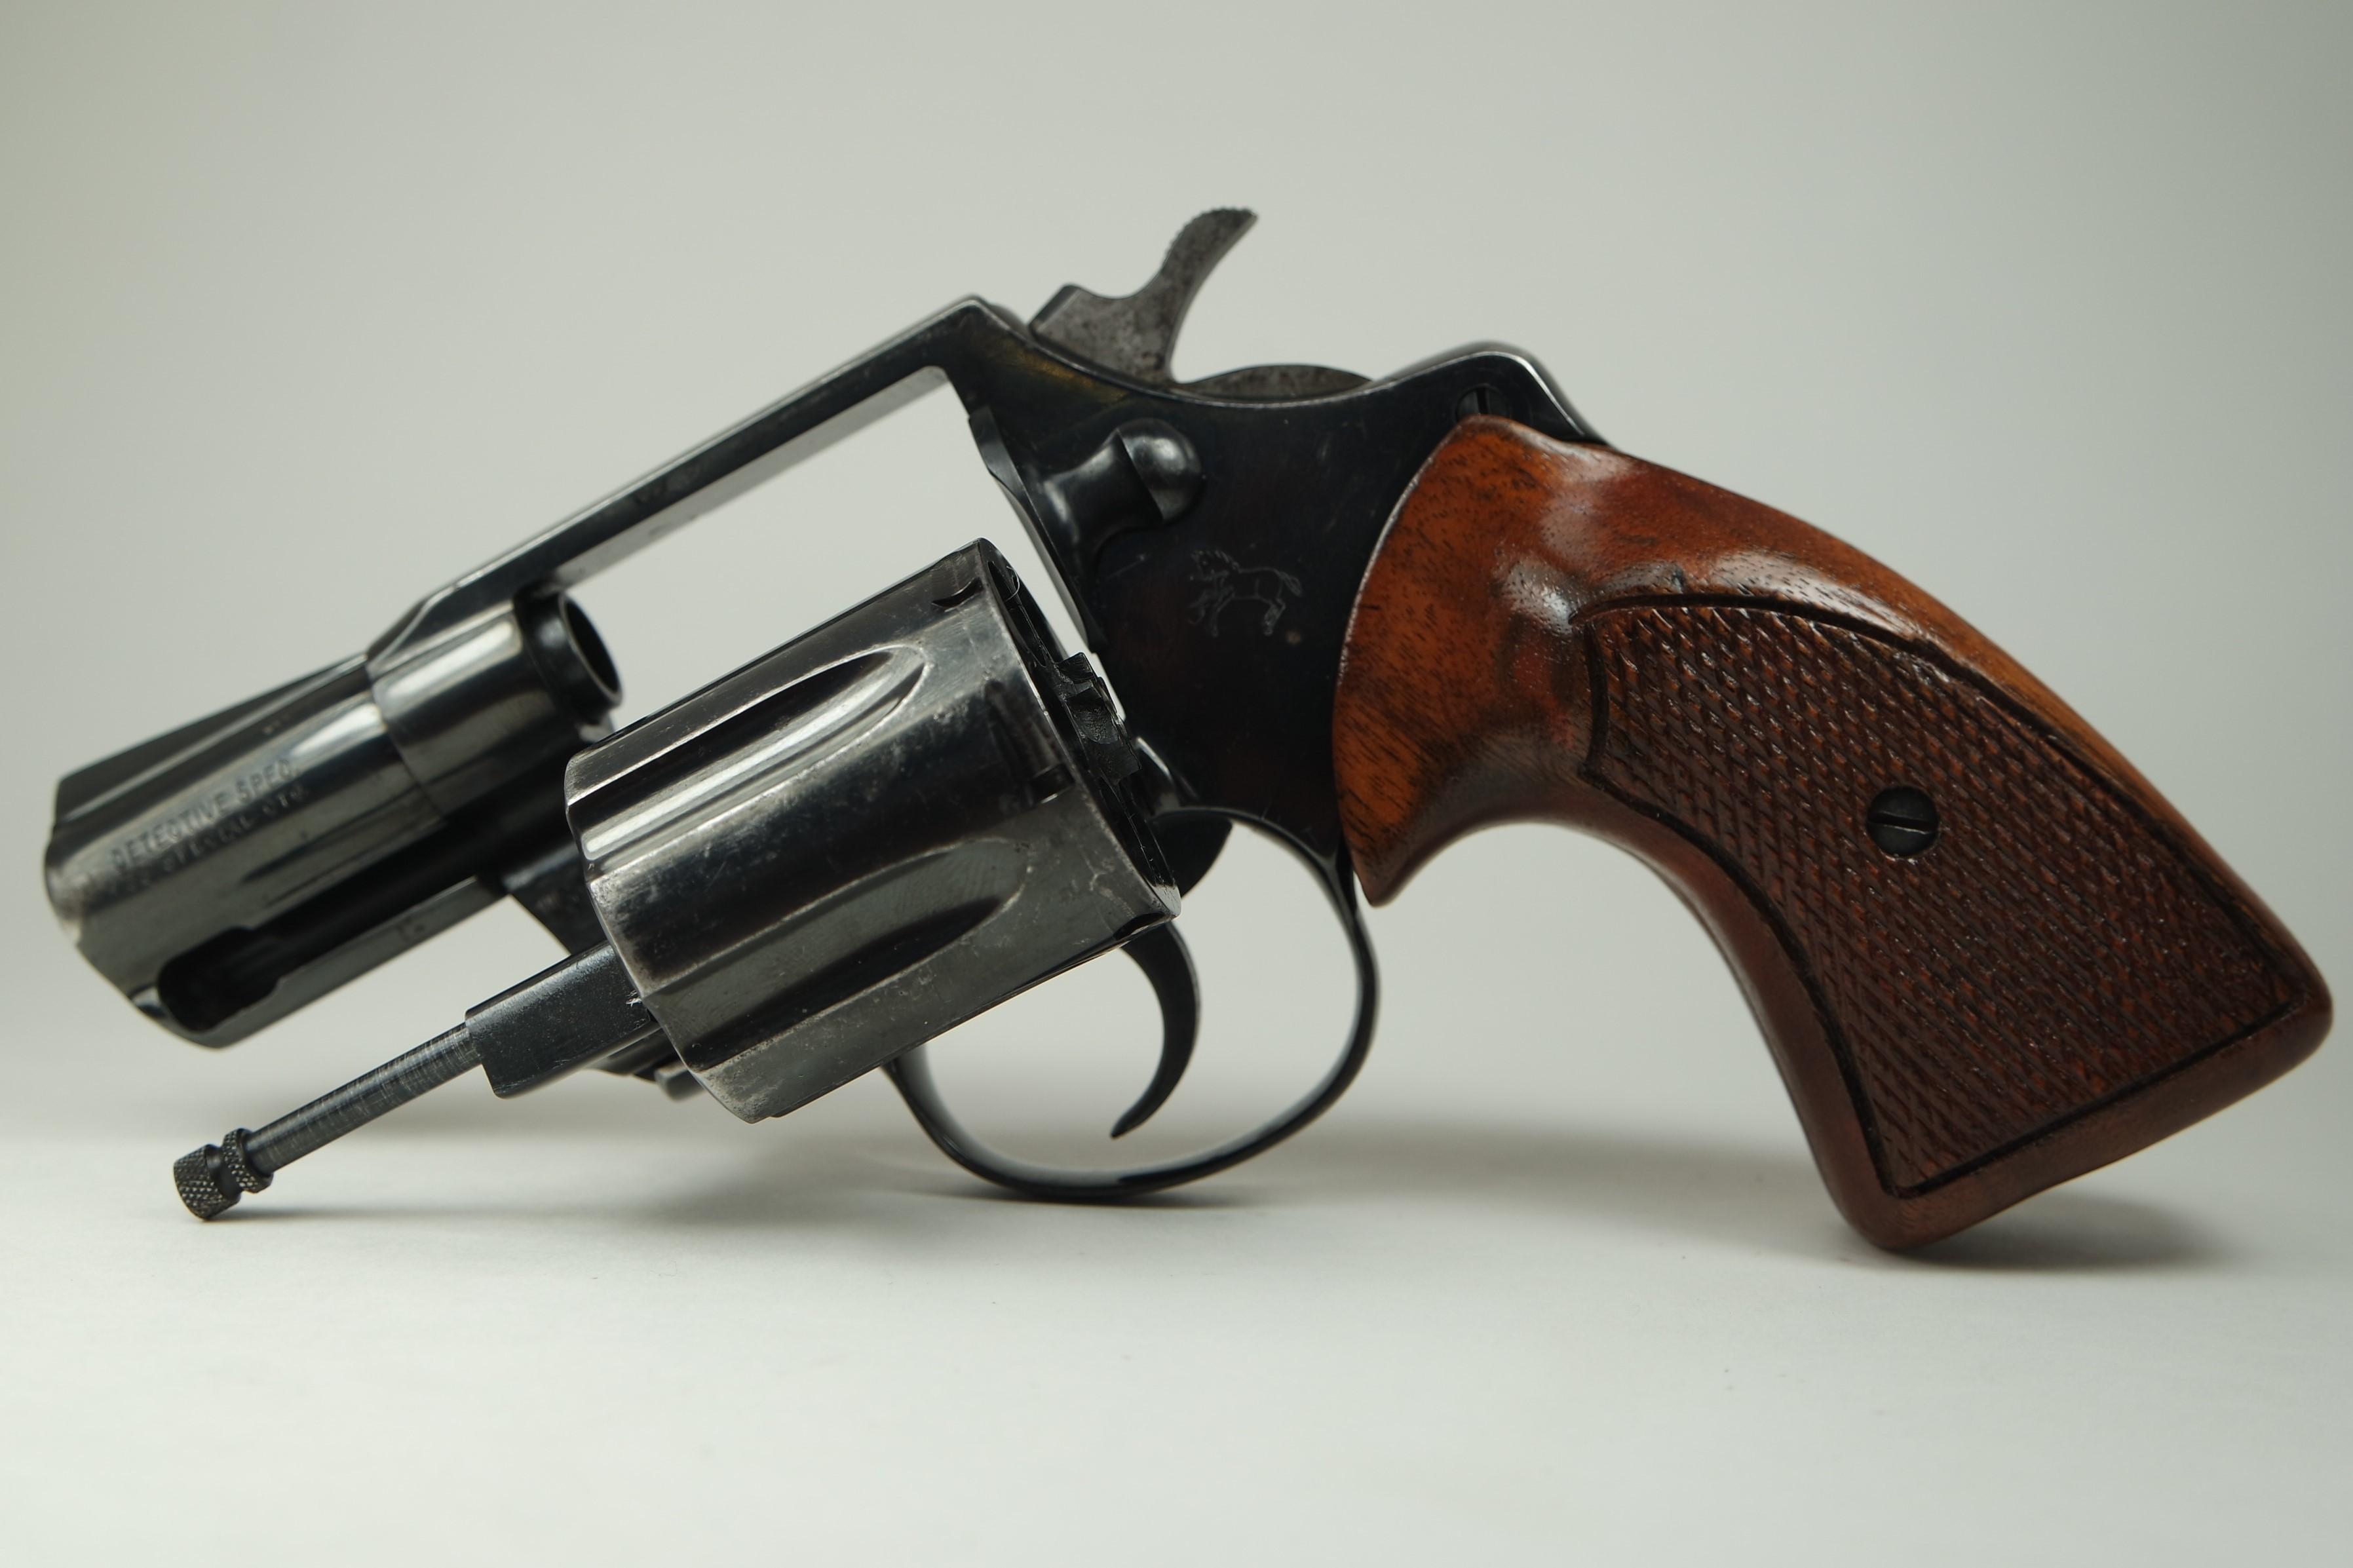 Colt Detective Spec .38 1975 H39965 Revolver Pre-Owned